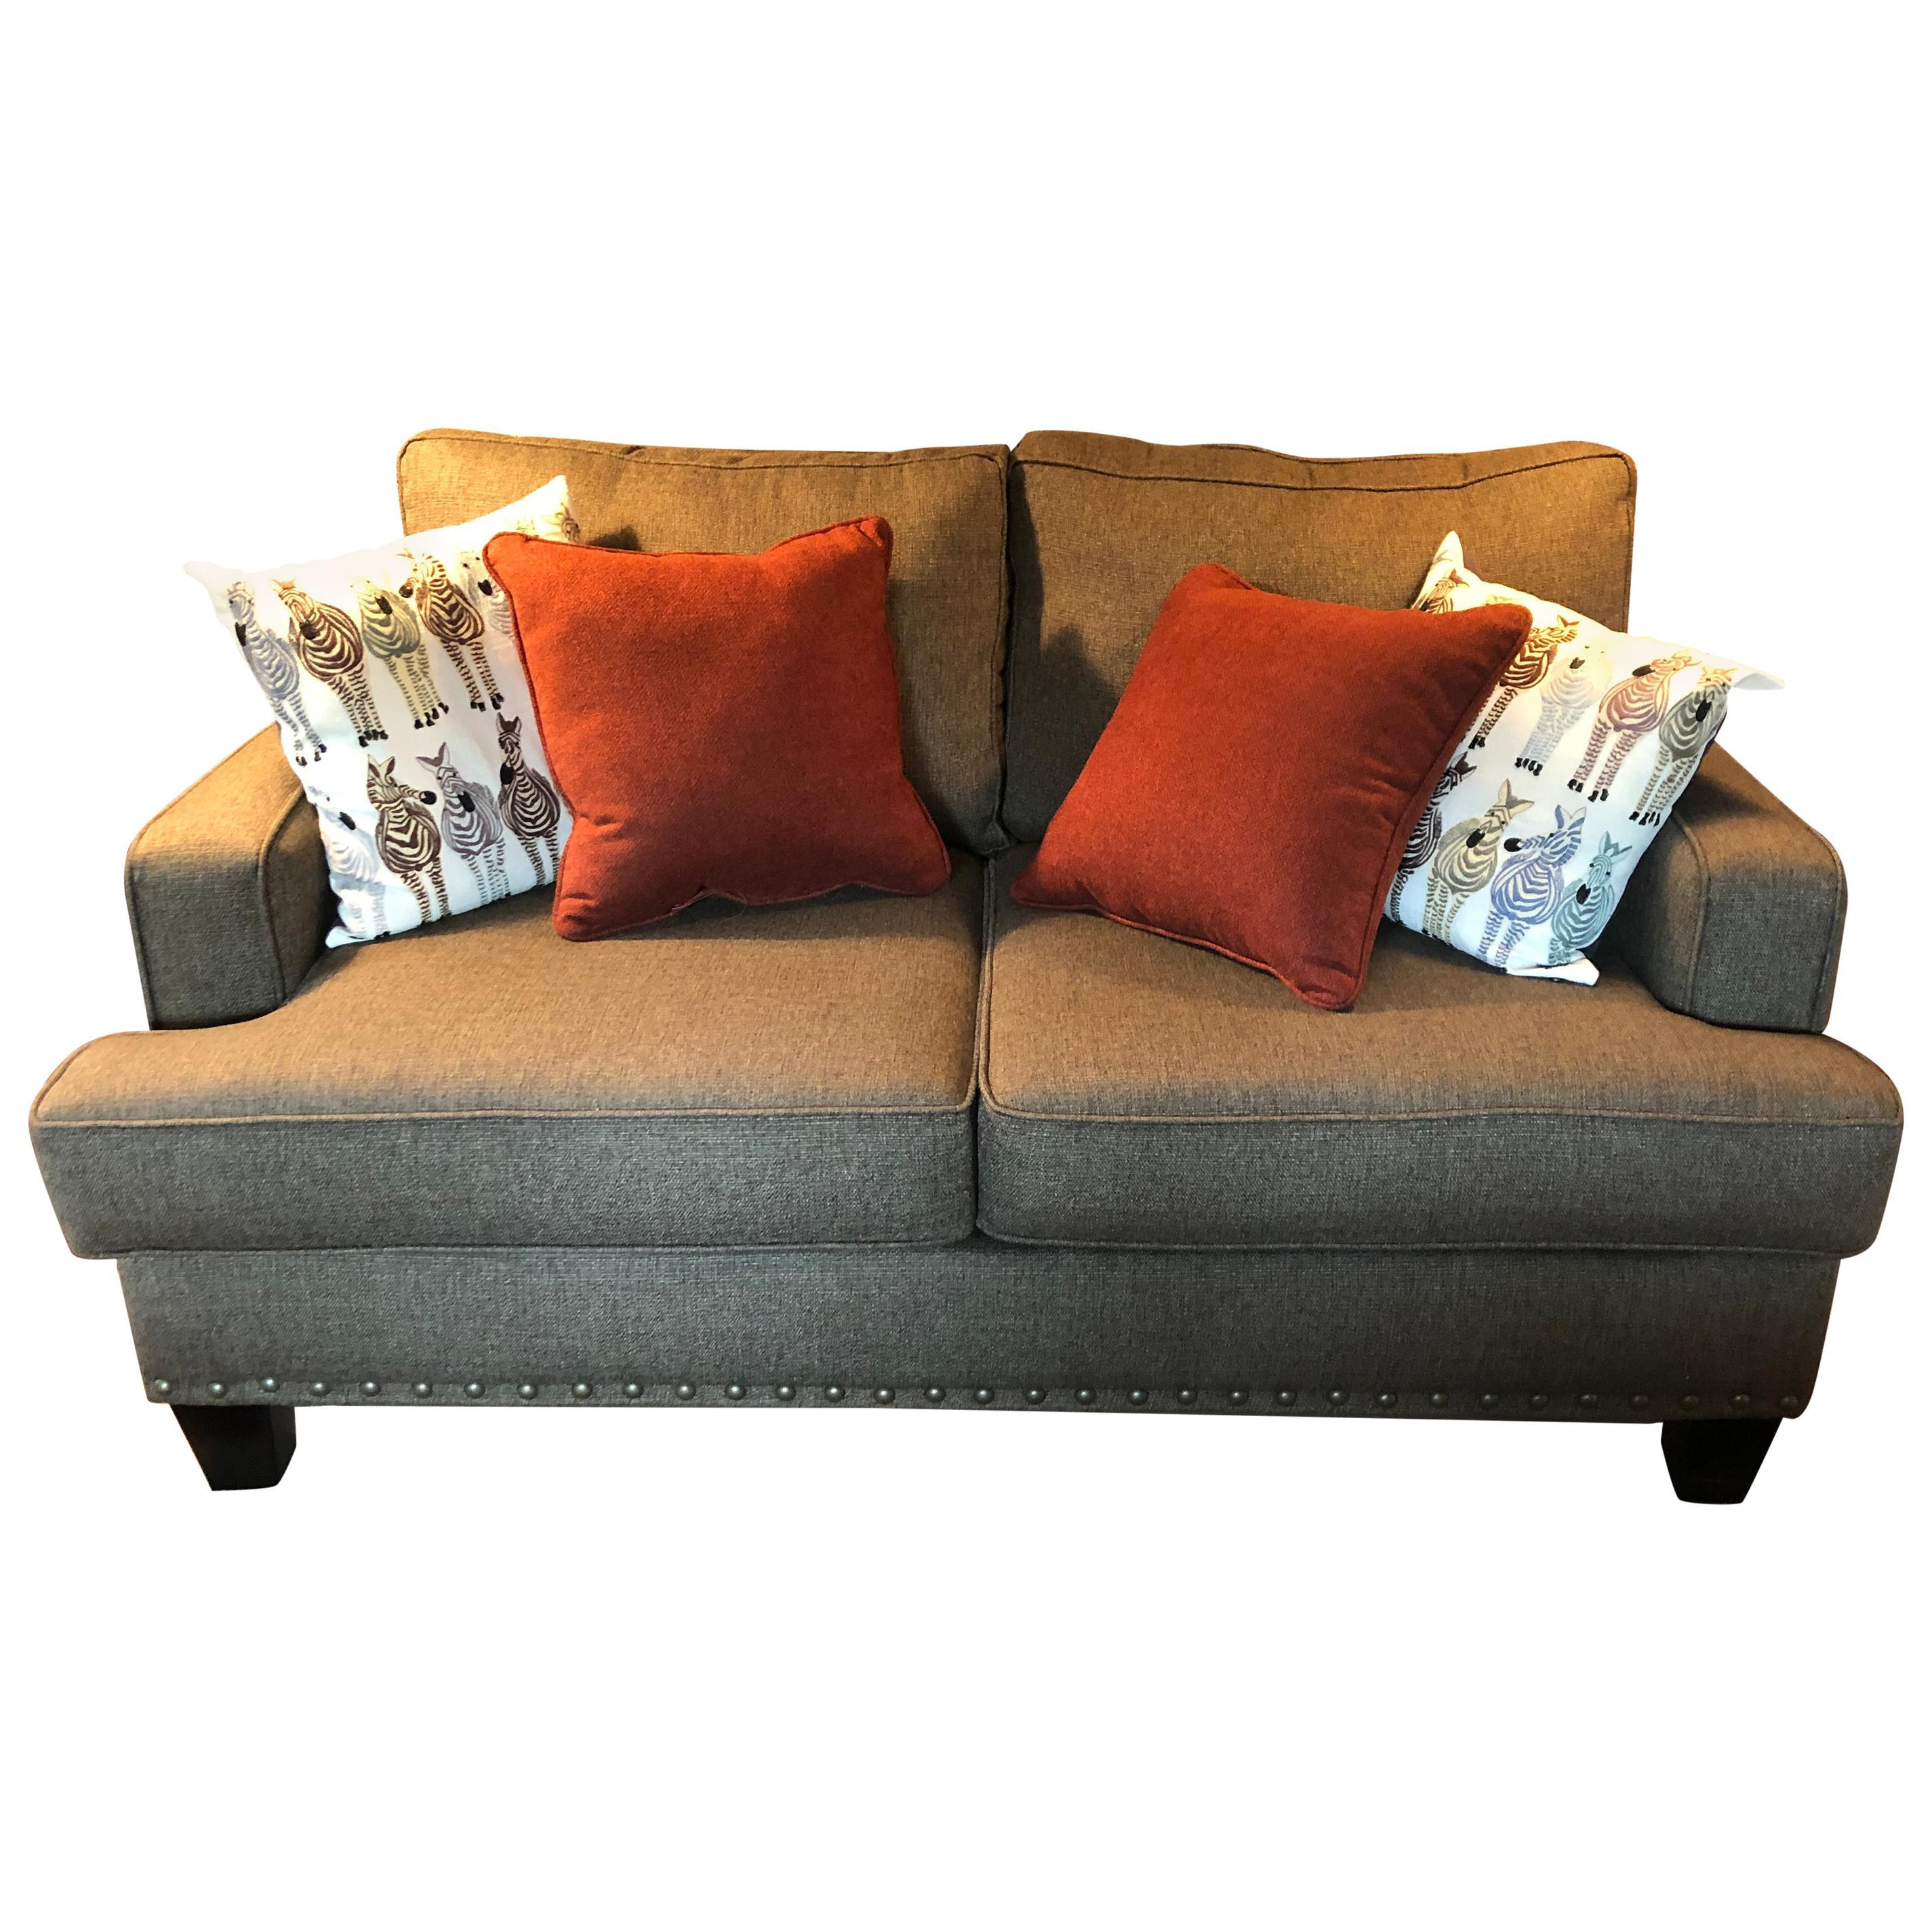 Custom Stylish Designer Upholstered Loveseat Sofa with Large Brass Nailheads